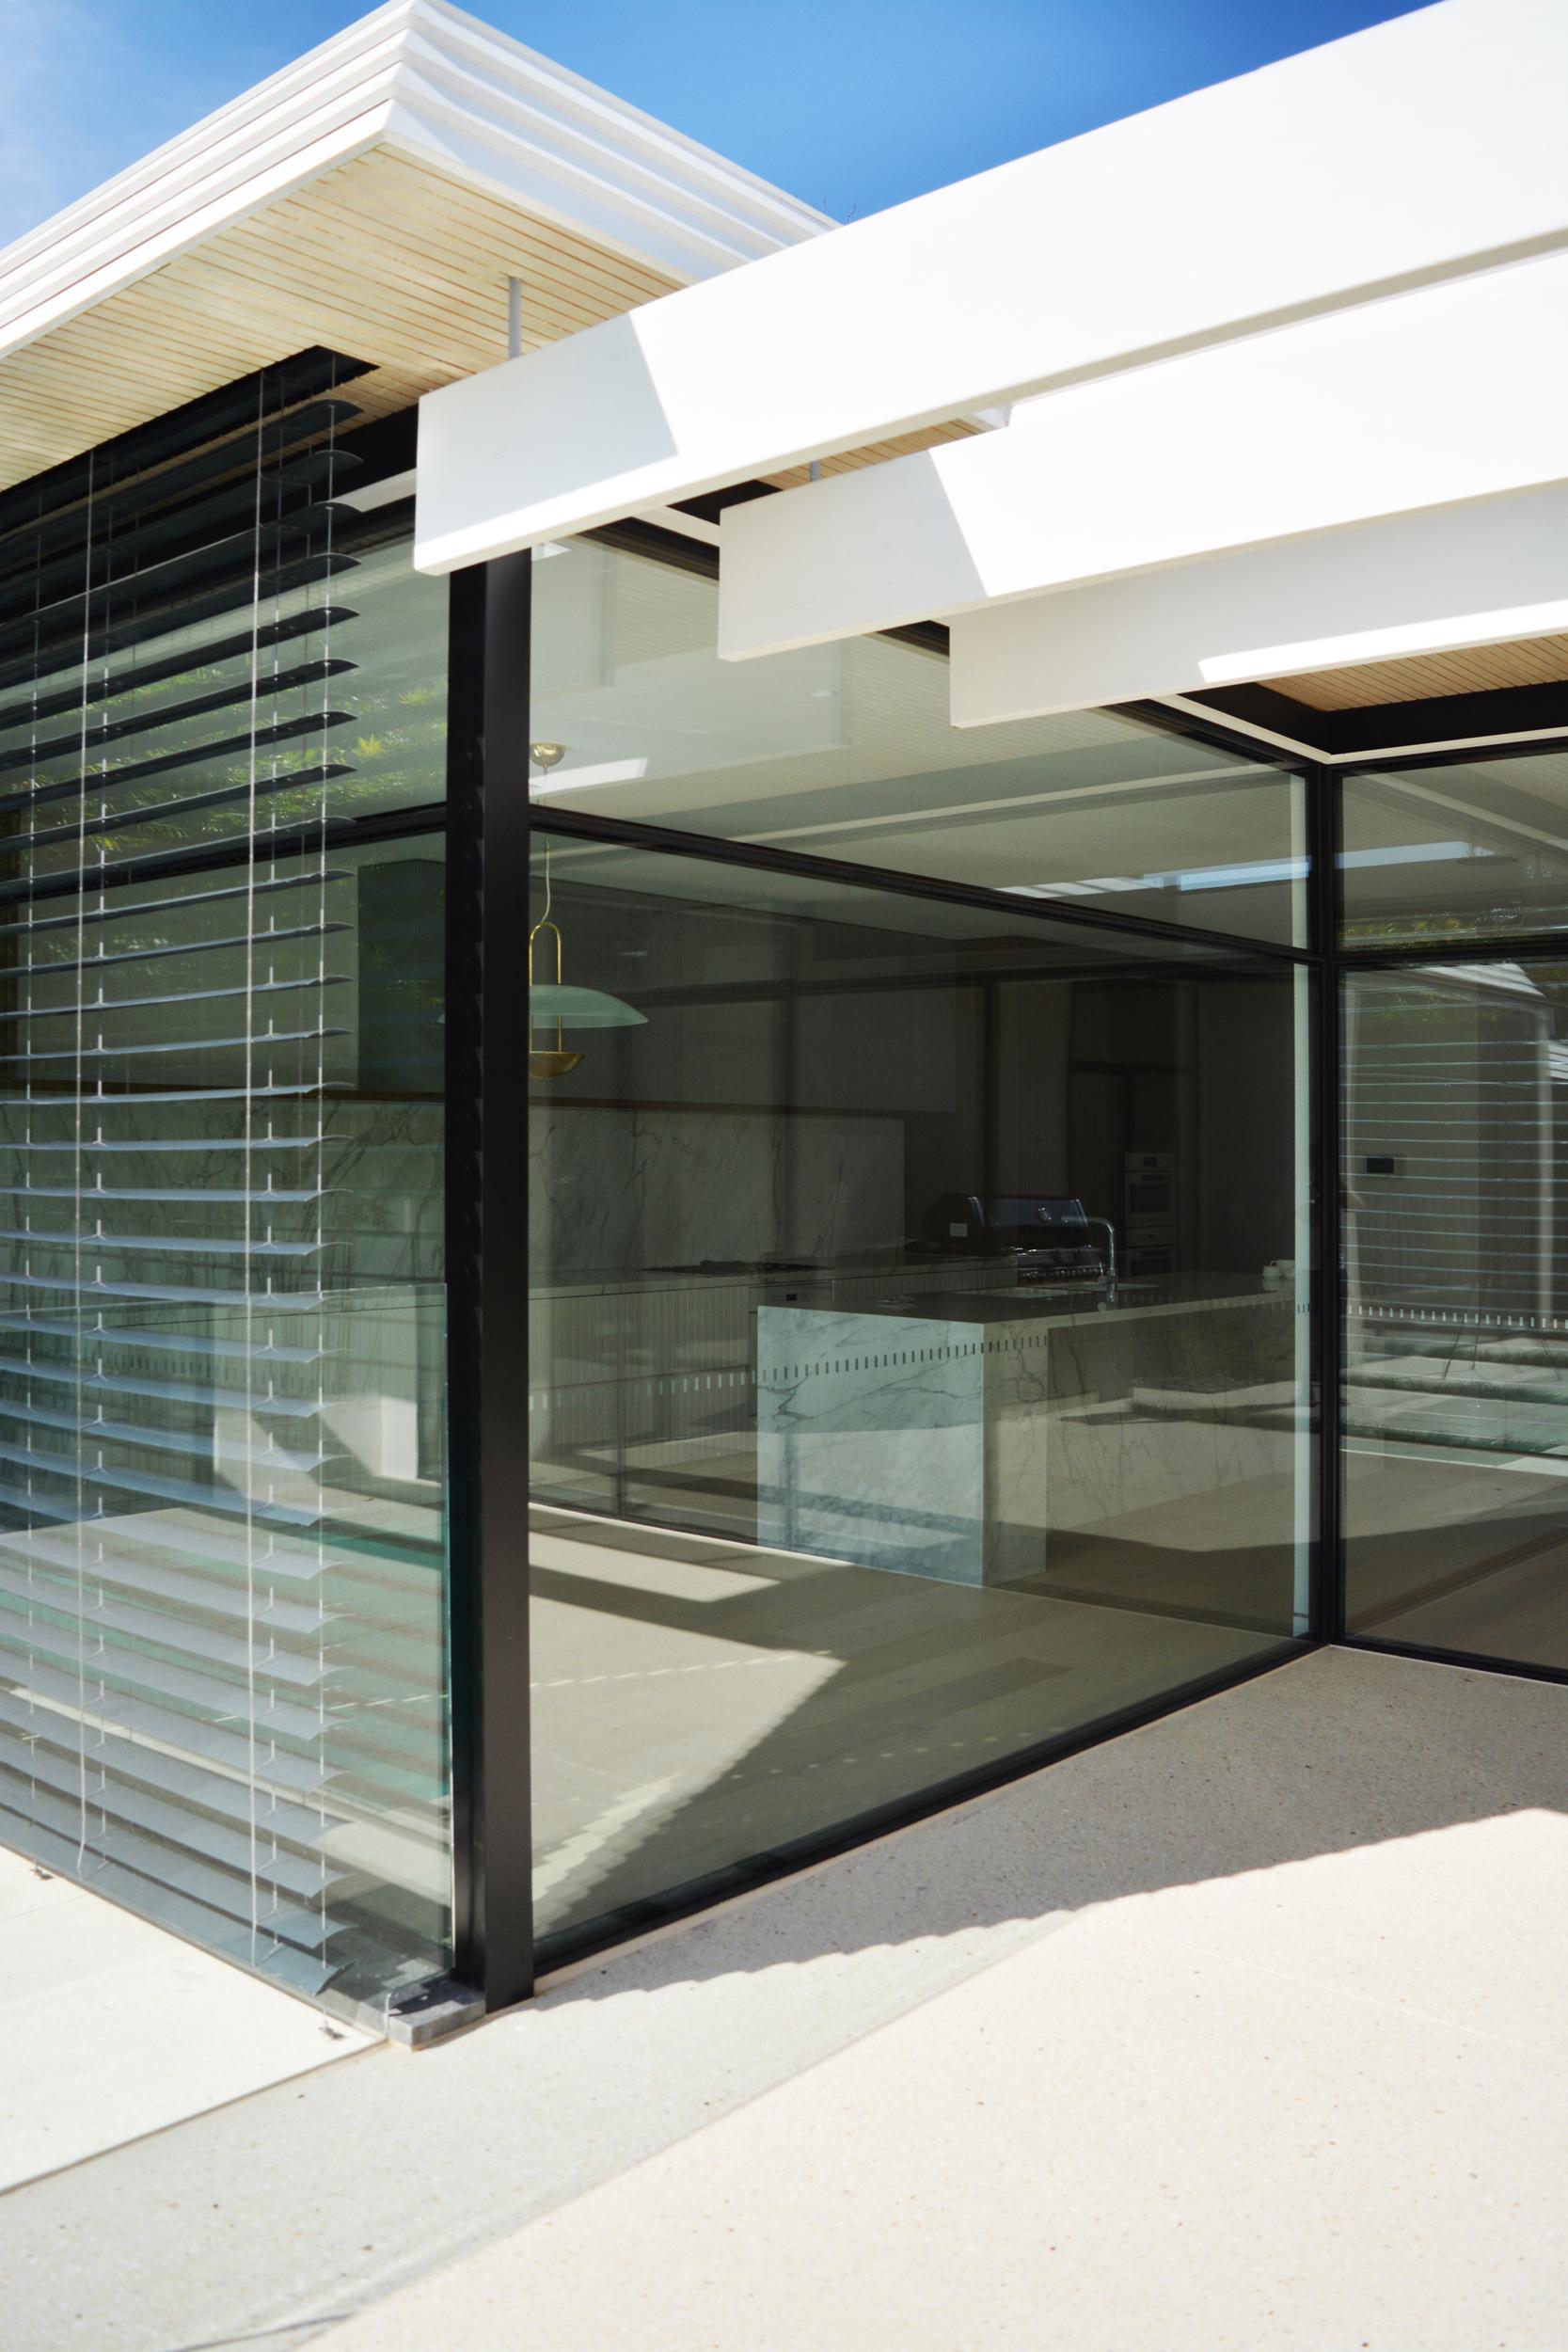 Mid Century Modern-Tecture-The Local Project-Australian Architecture & Design-Image 4